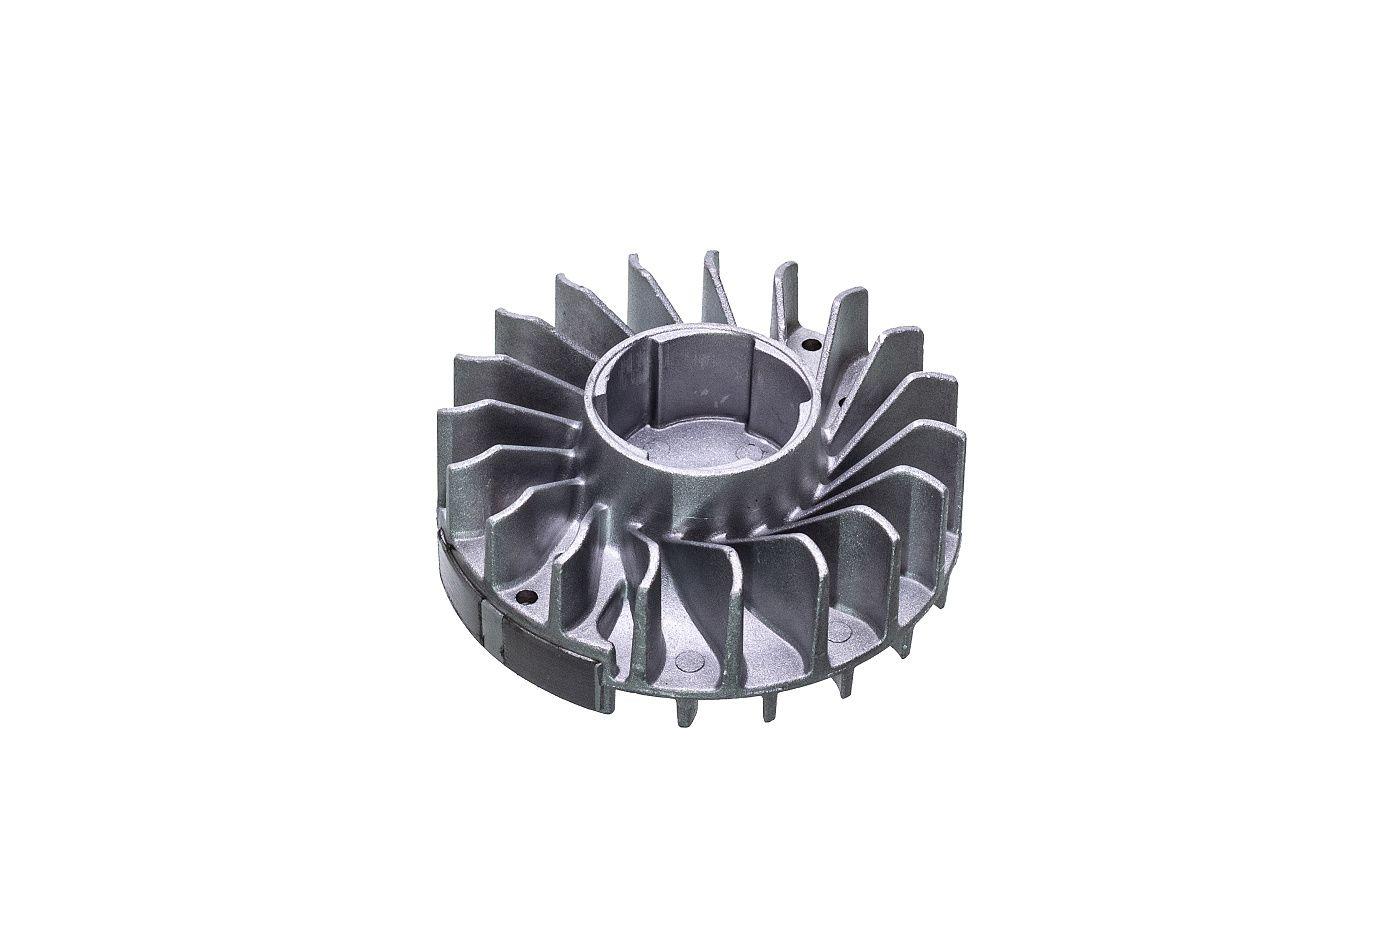 Ventilátor Stihl FS120 FS200 FS250 FS300 FS350